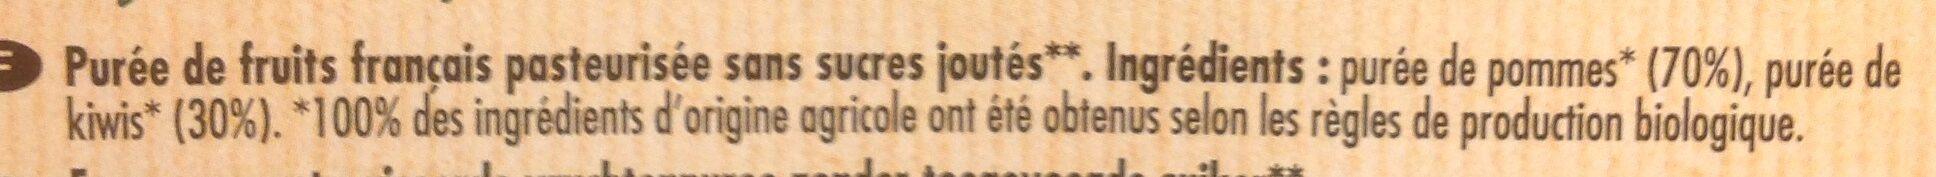 Purée 100% France Pomme & Kiwi - Ingrédients - fr